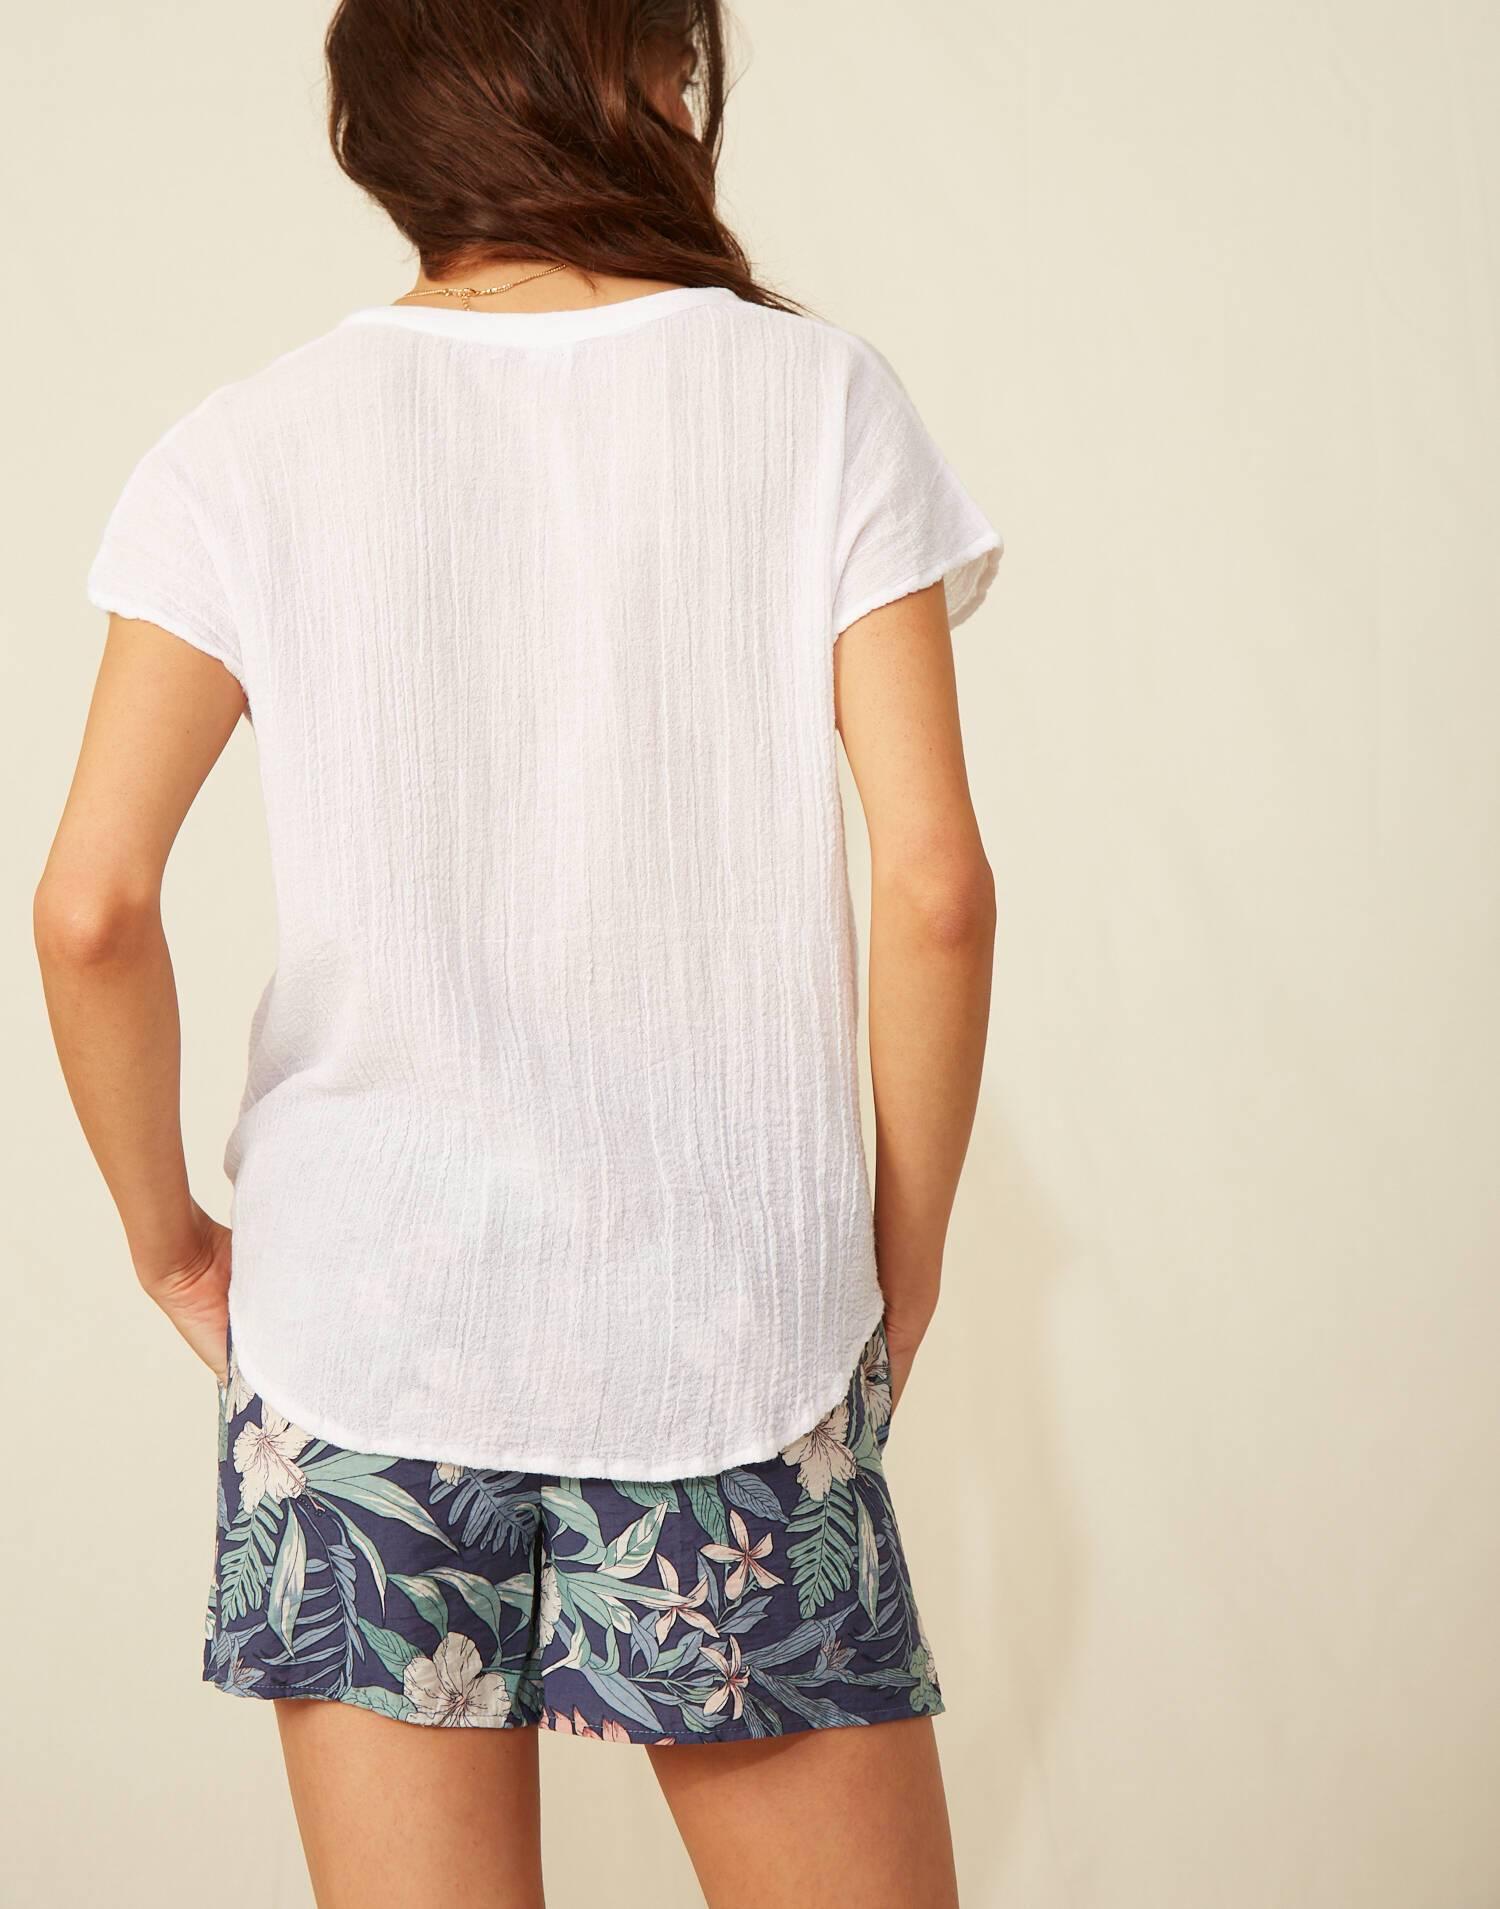 Camiseta manga corta  bolsillo